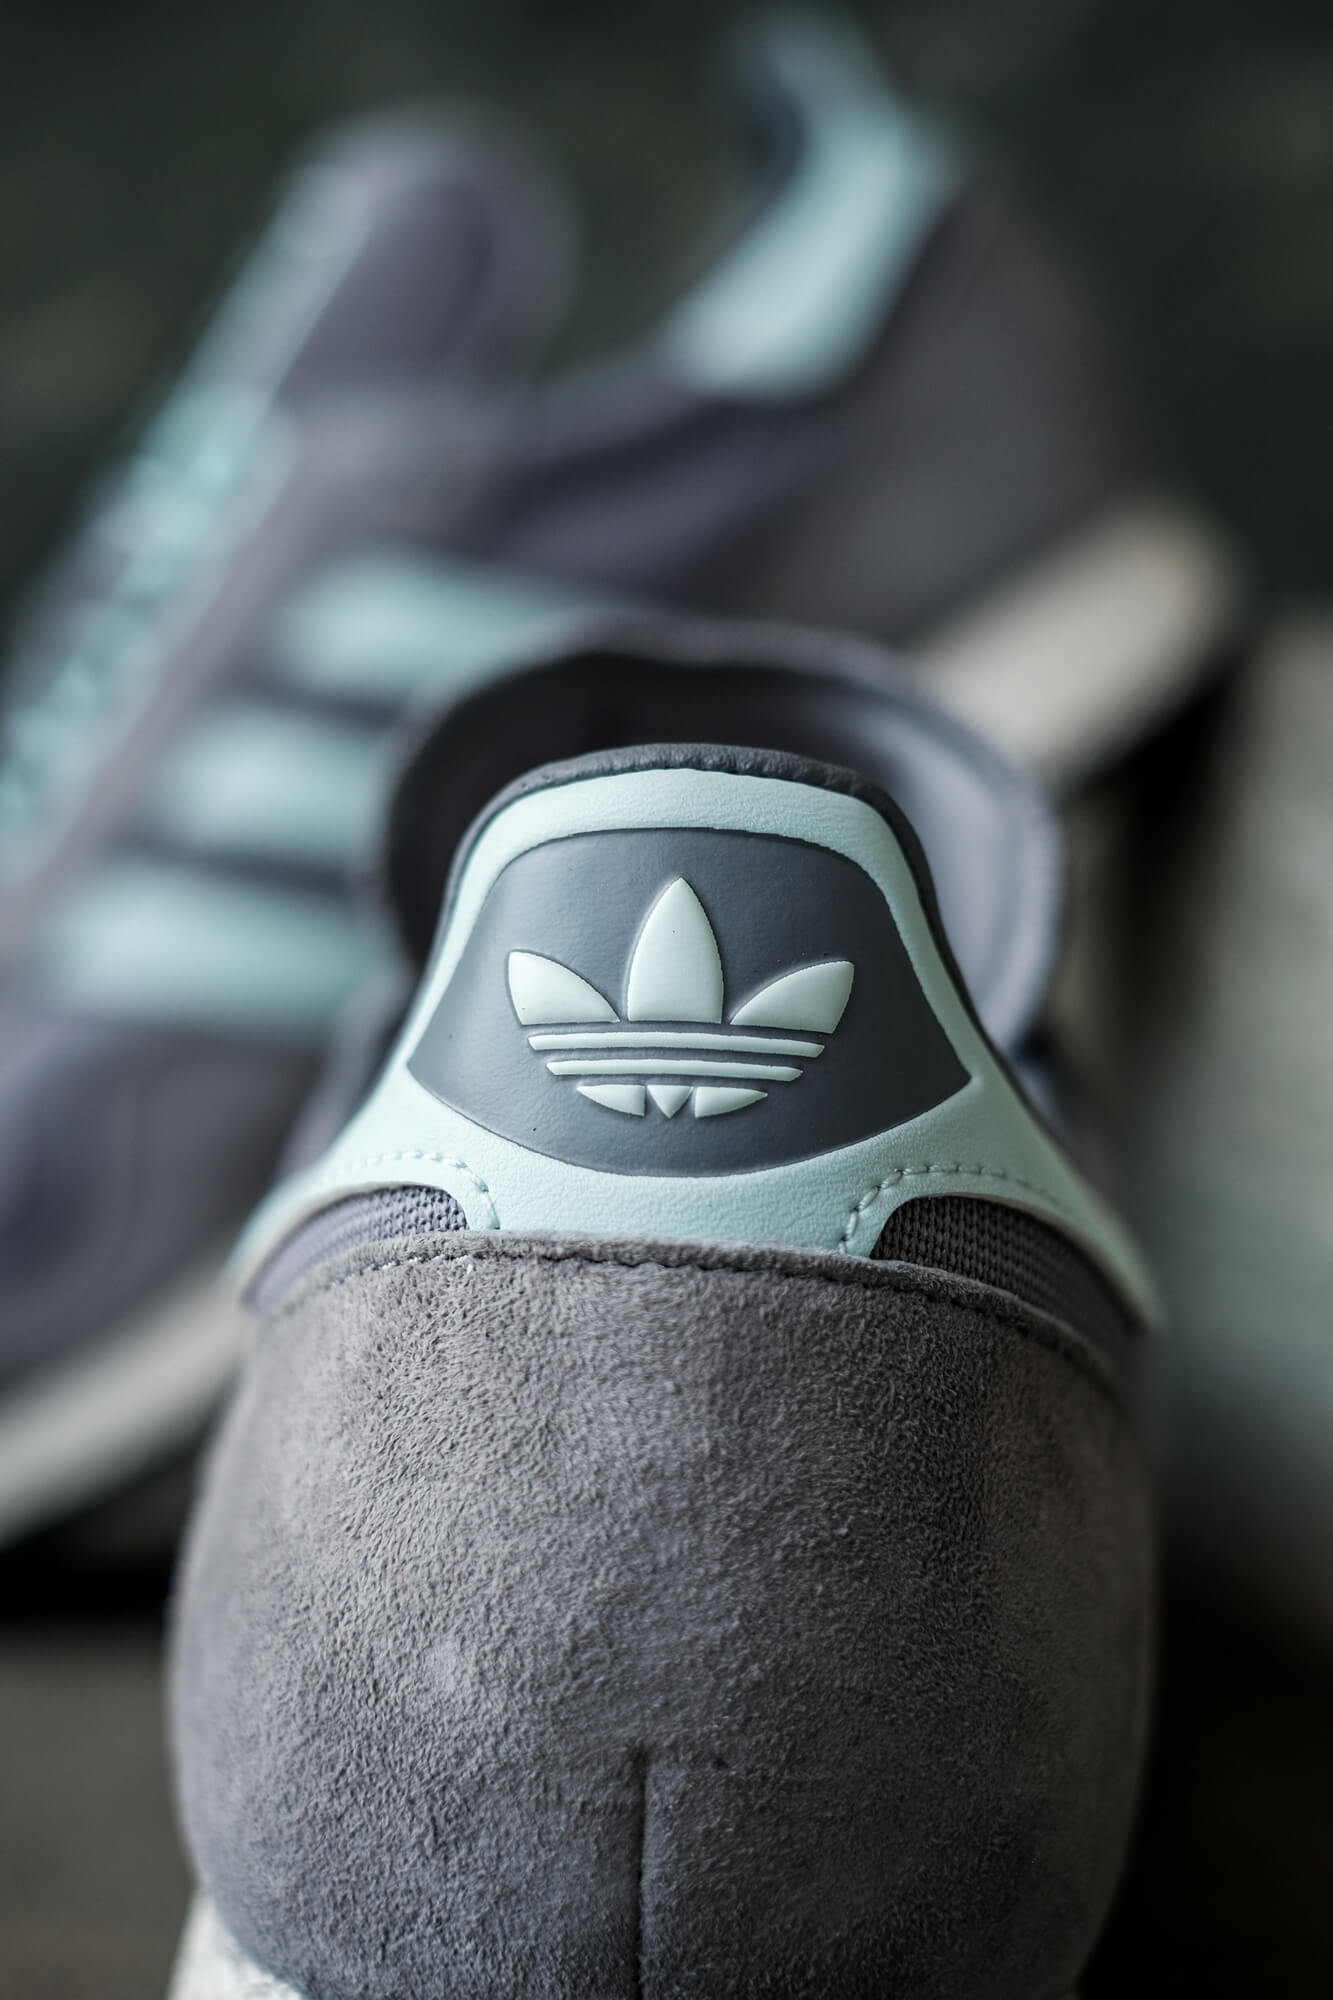 detail of the heel, inverted adidas trefoil of the adidas New York OG sneaker